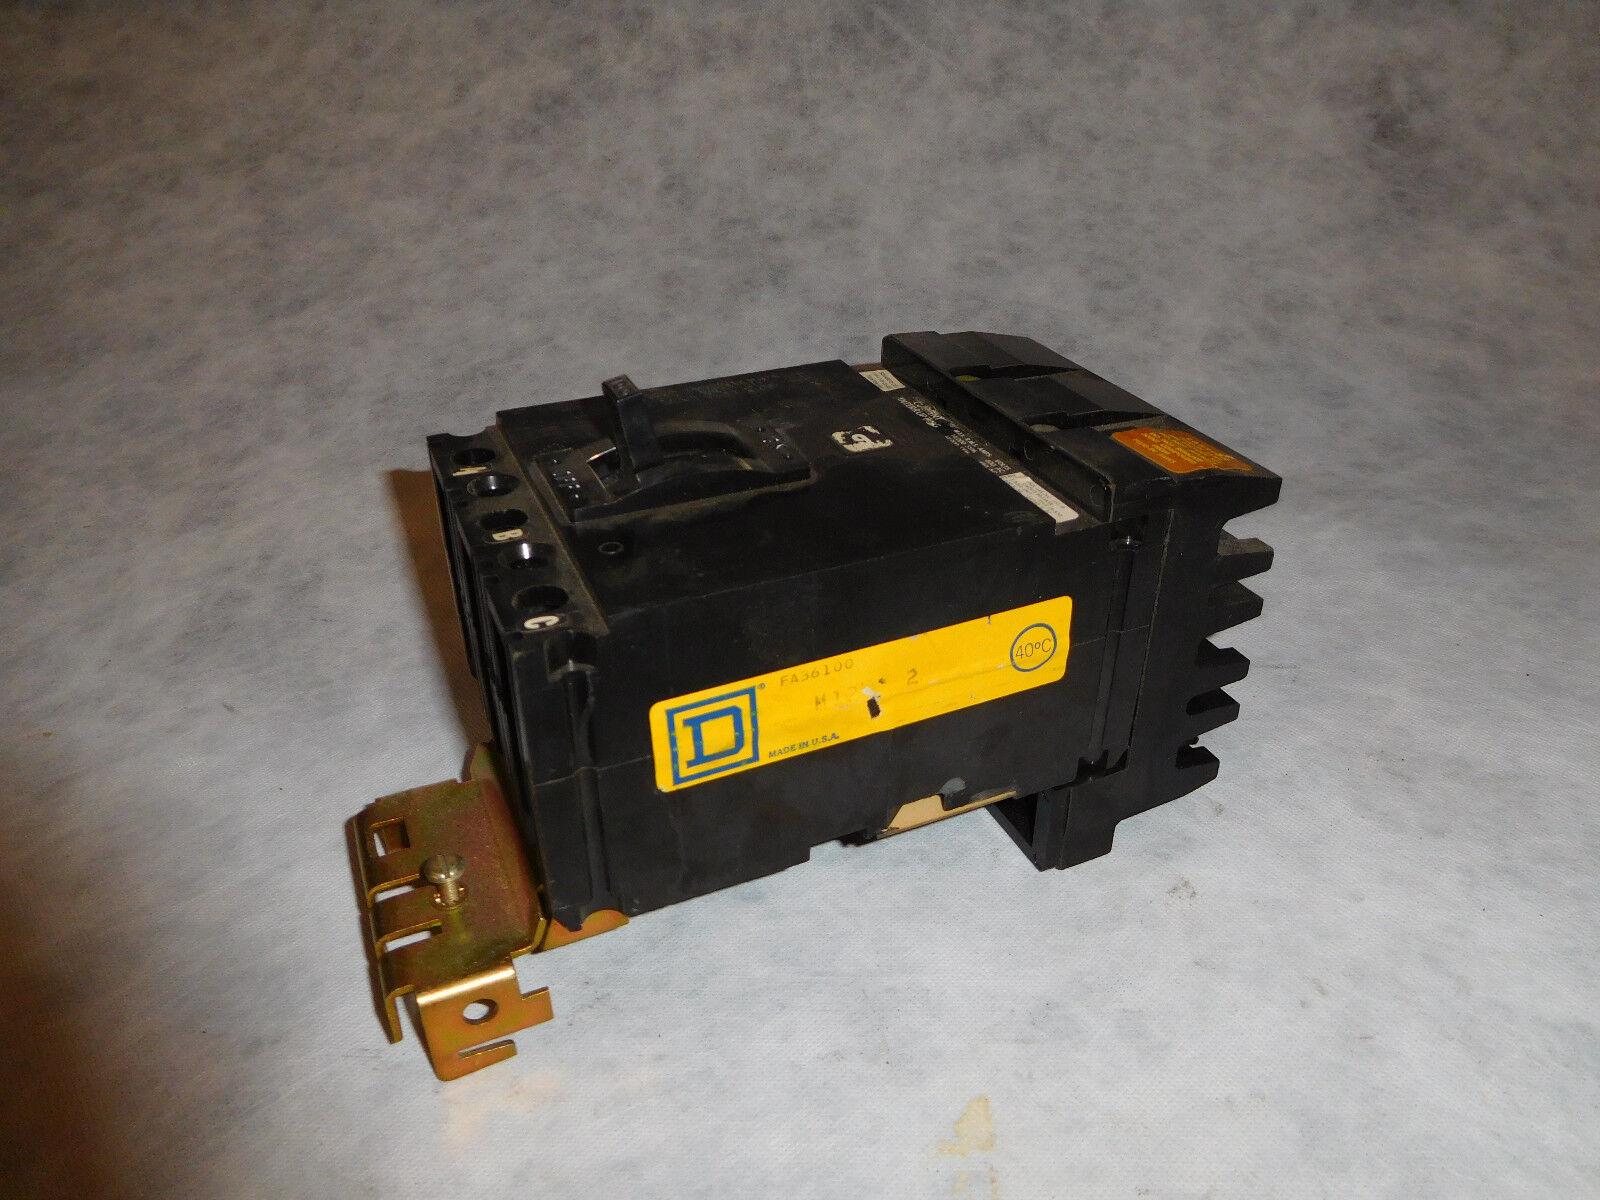 Square D FA36100 100Amp I-Line Circuit Breake 3 Pole 600V